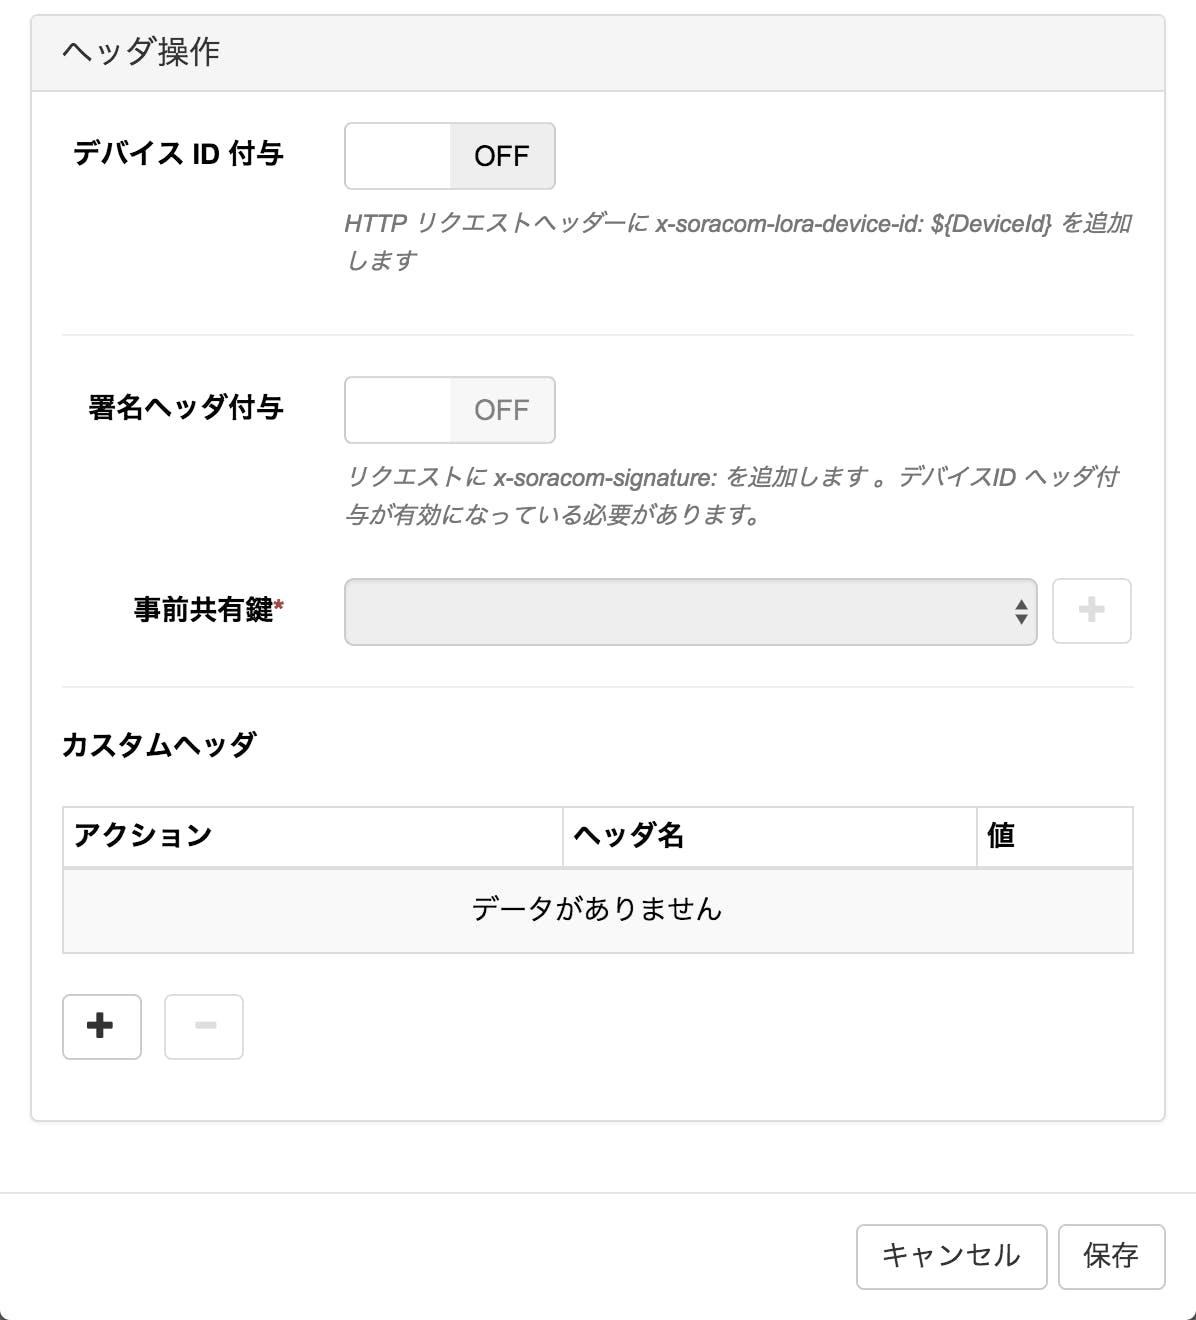 201_soracom_beam_config_list2.png